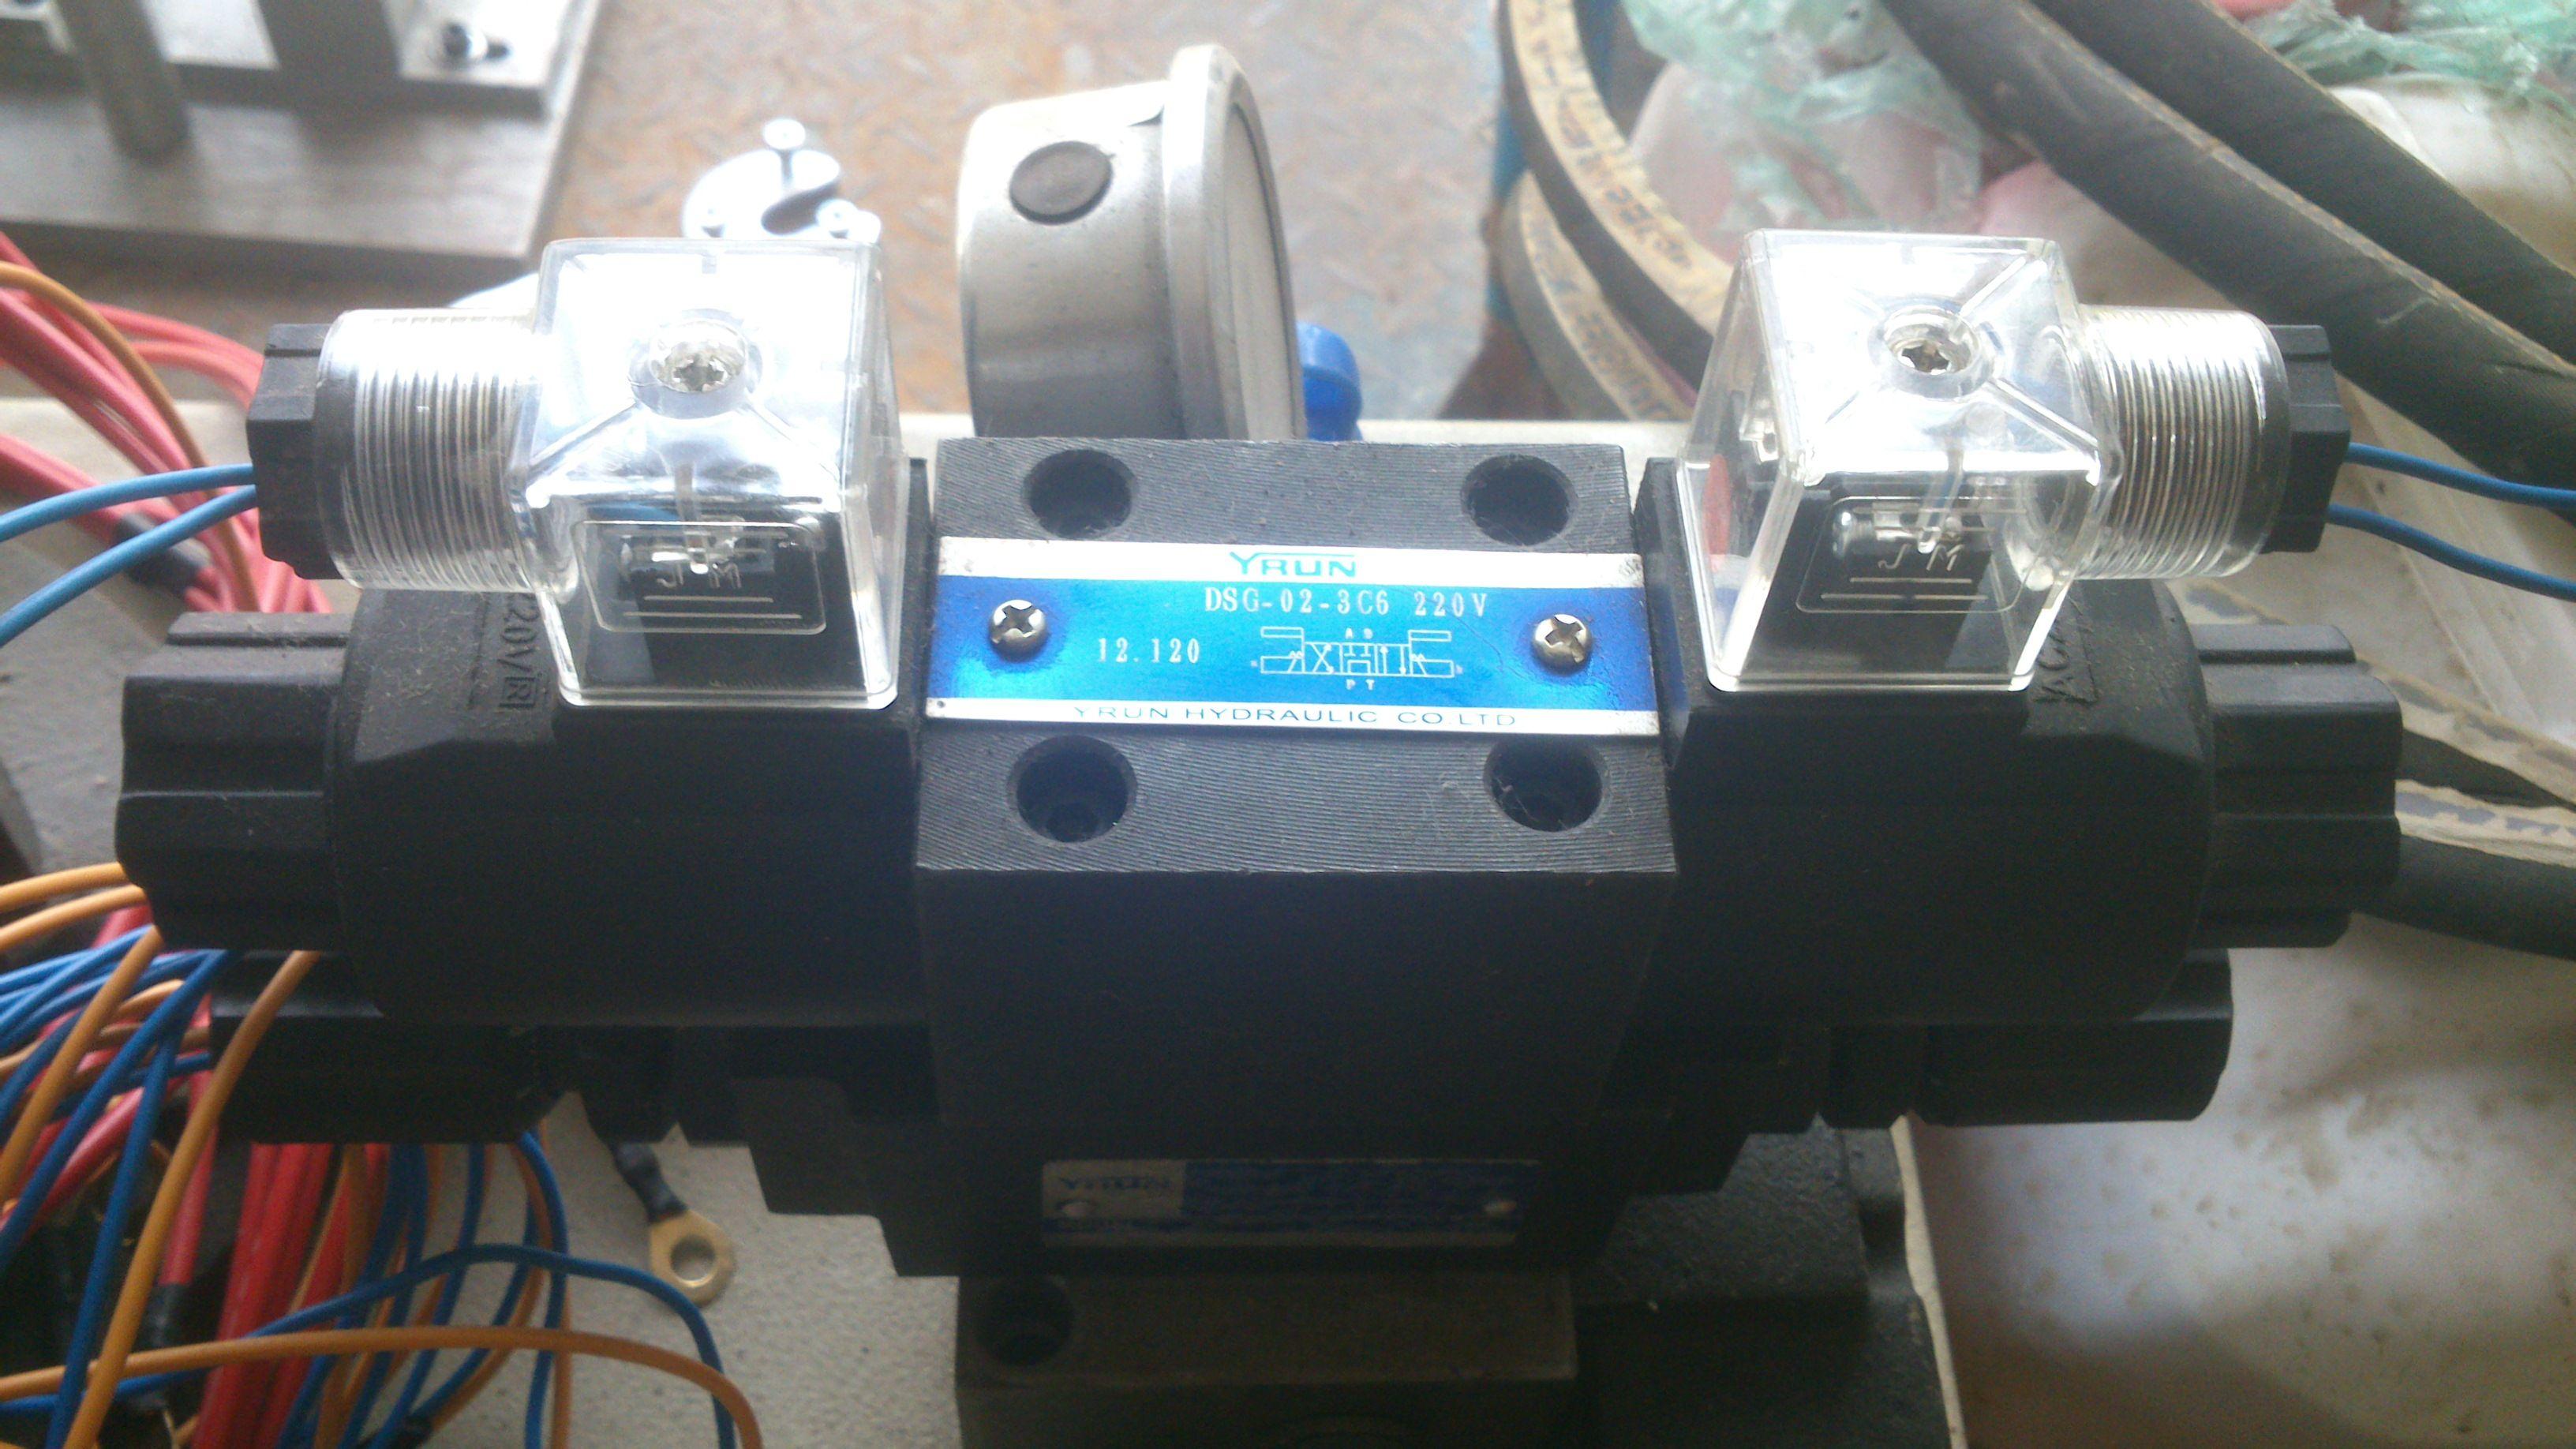 dsg-02-3c6 220v这种电磁阀怎么接线?急求!!!没接触过图片